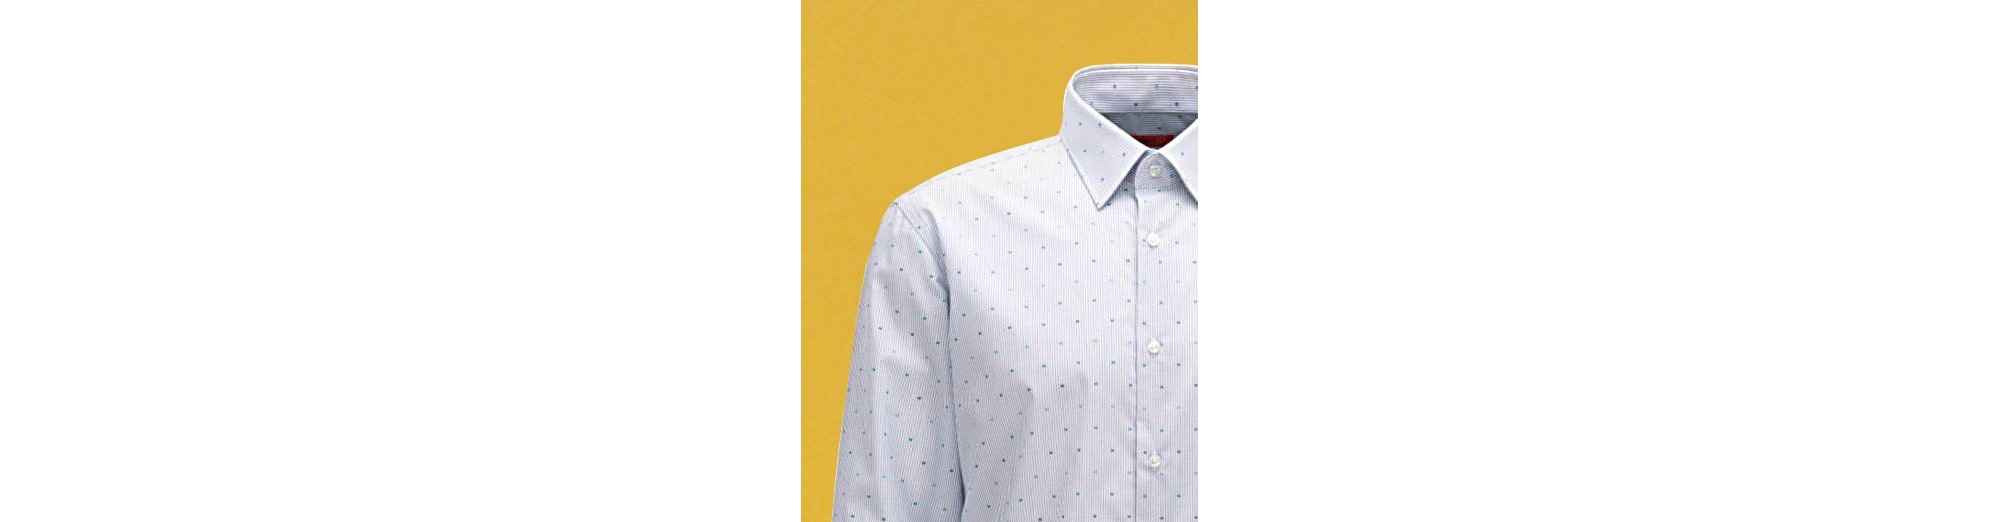 Shirt by HUGO